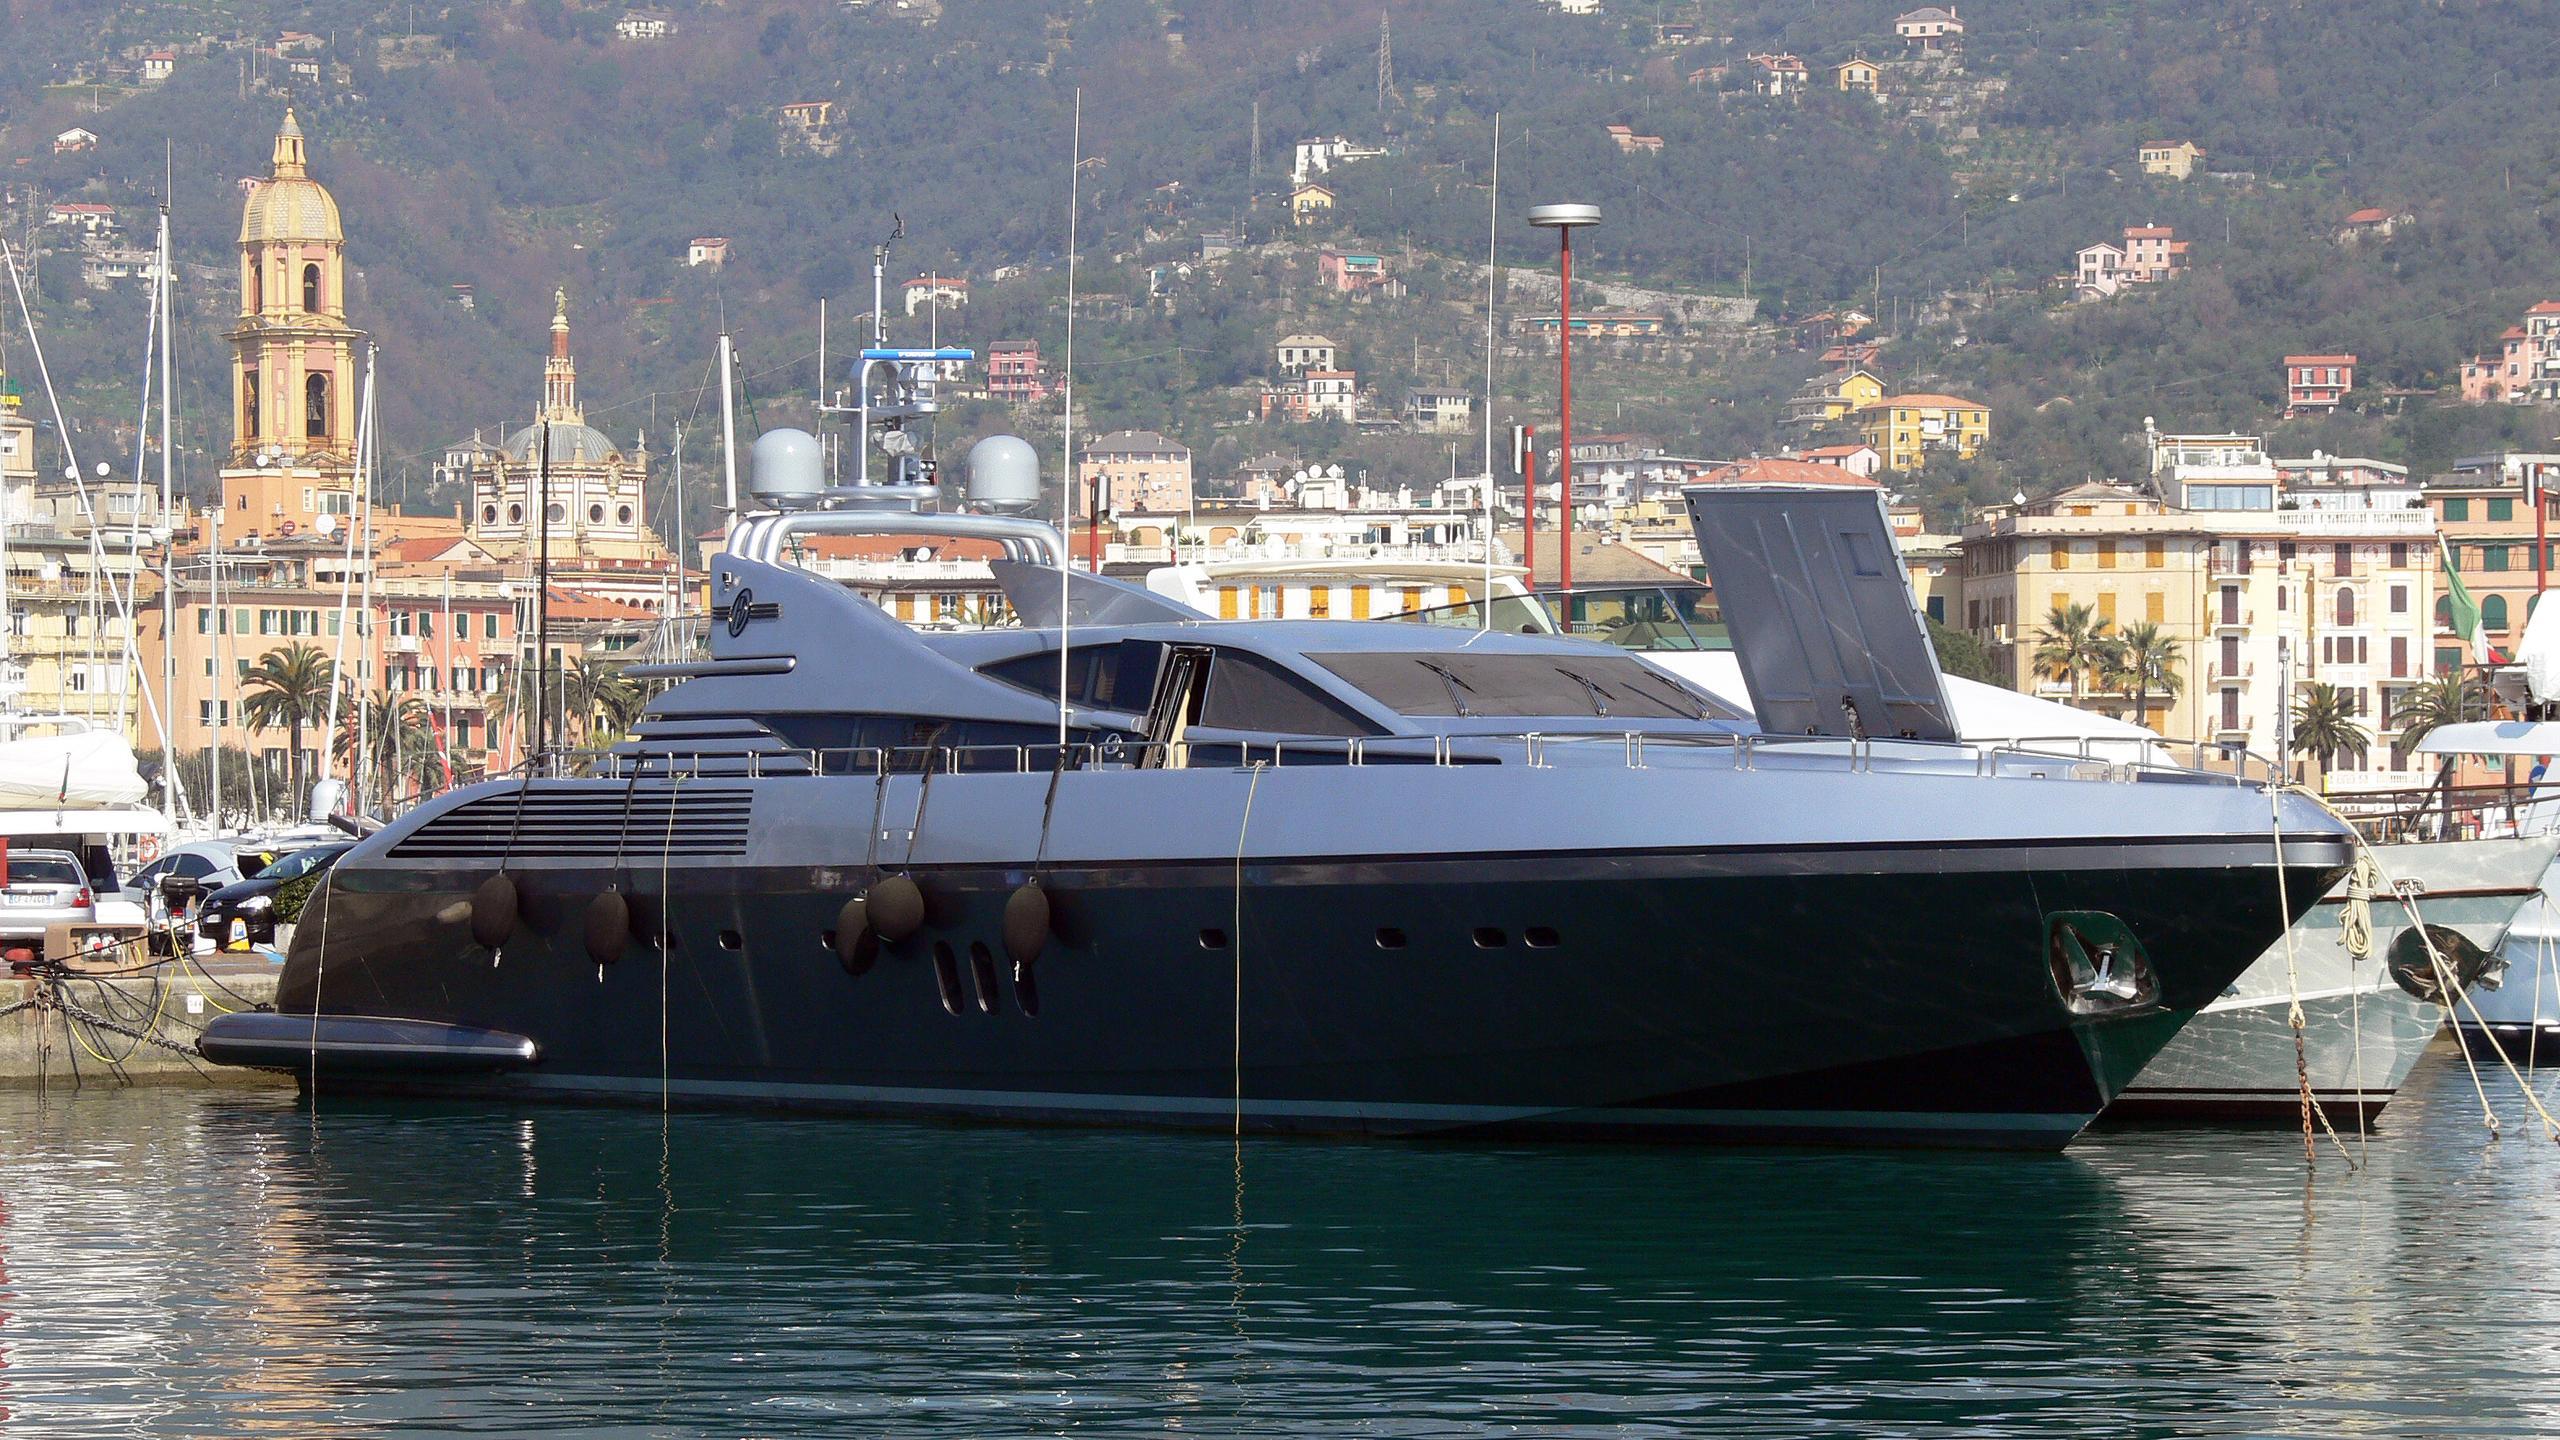 exxtreme-motor-yacht-codecasa-2005-35s-35m-half-profile